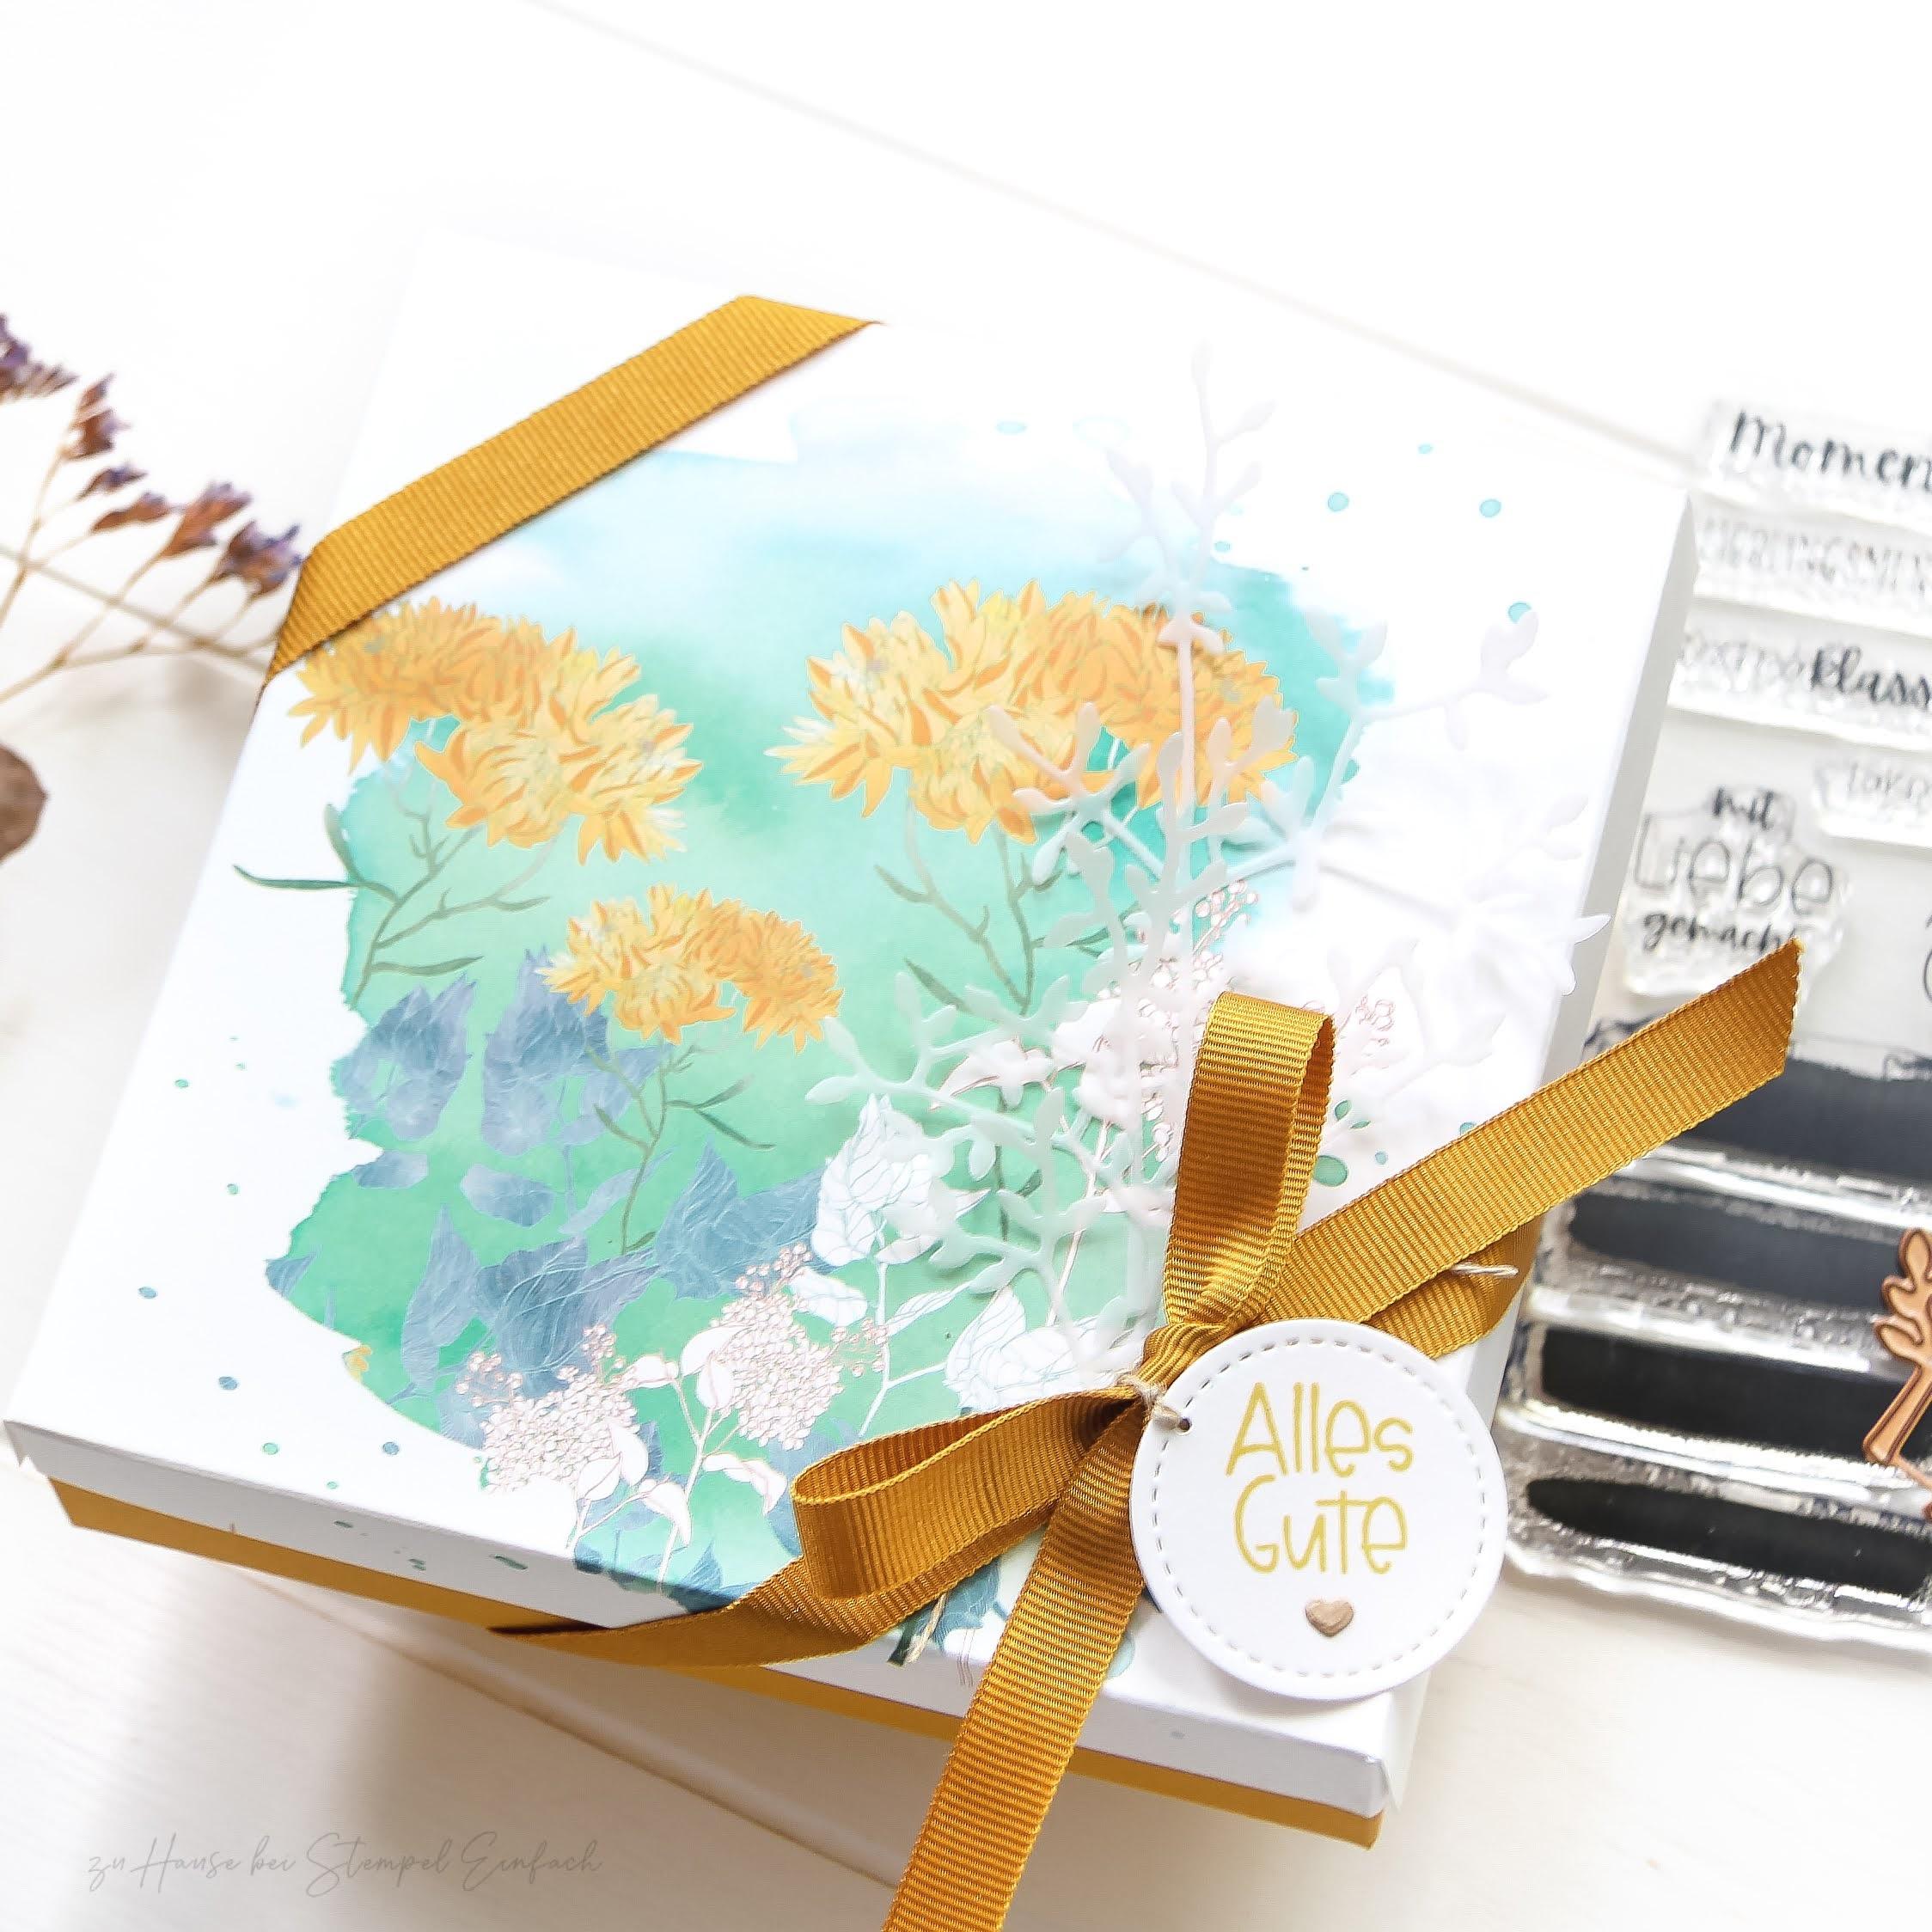 verpackung-designpapier-memories-blumenklecks